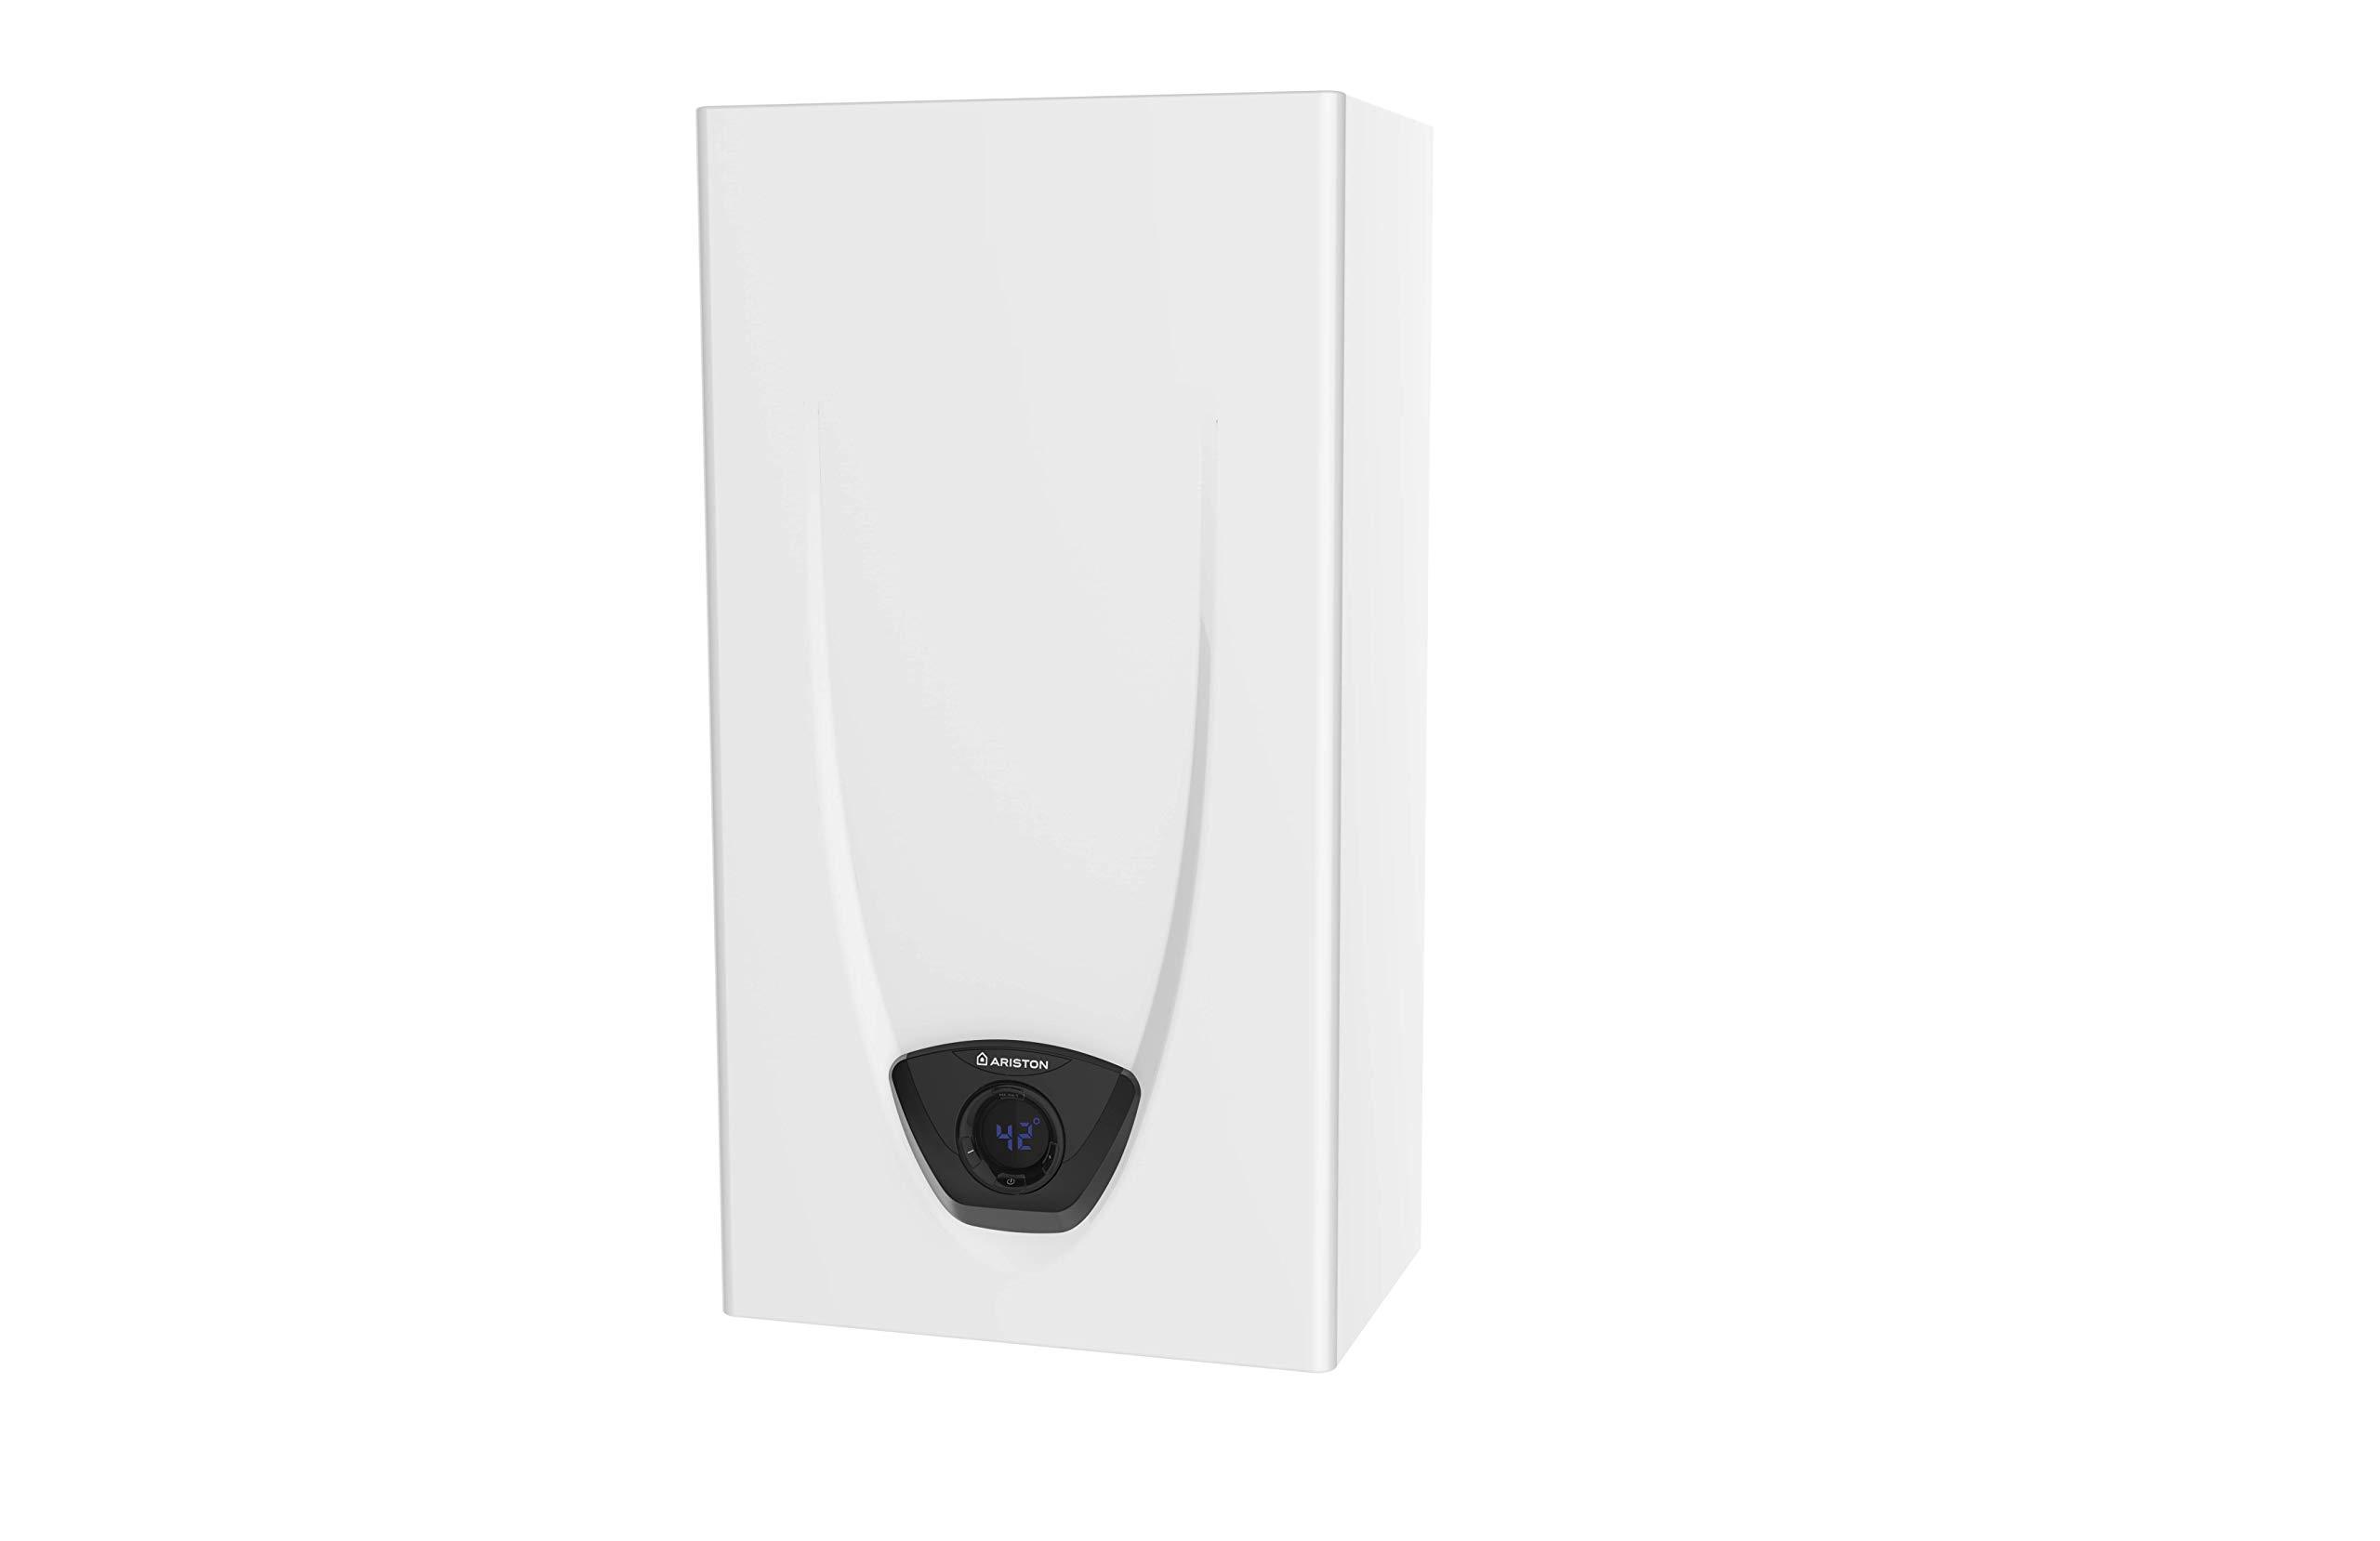 Ariston – Calentador de gas instantáneo para cámara abierta, Camera aperta 14 Lt/minuto